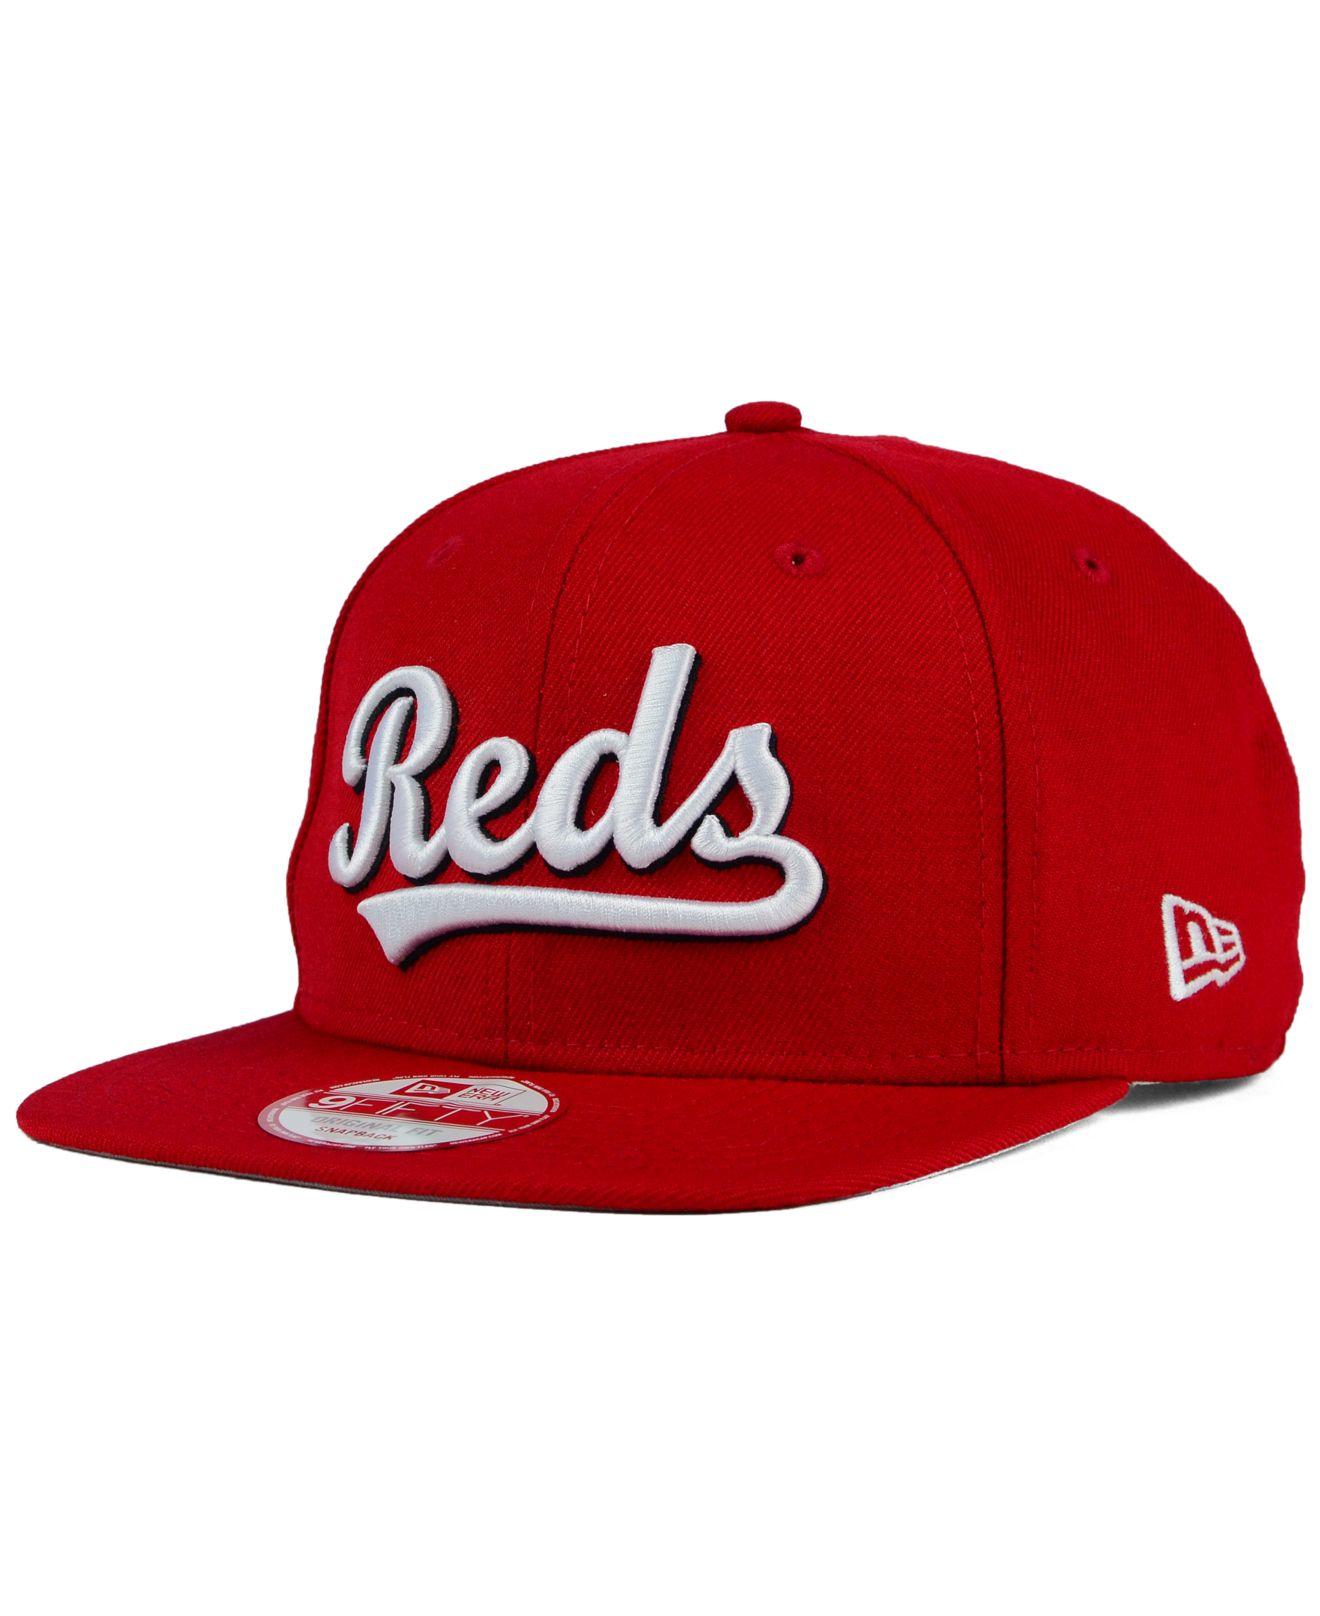 62b82189 ... order lyst ktz cincinnati reds xl script 9fifty snapback cap in red for  men d58be f3753